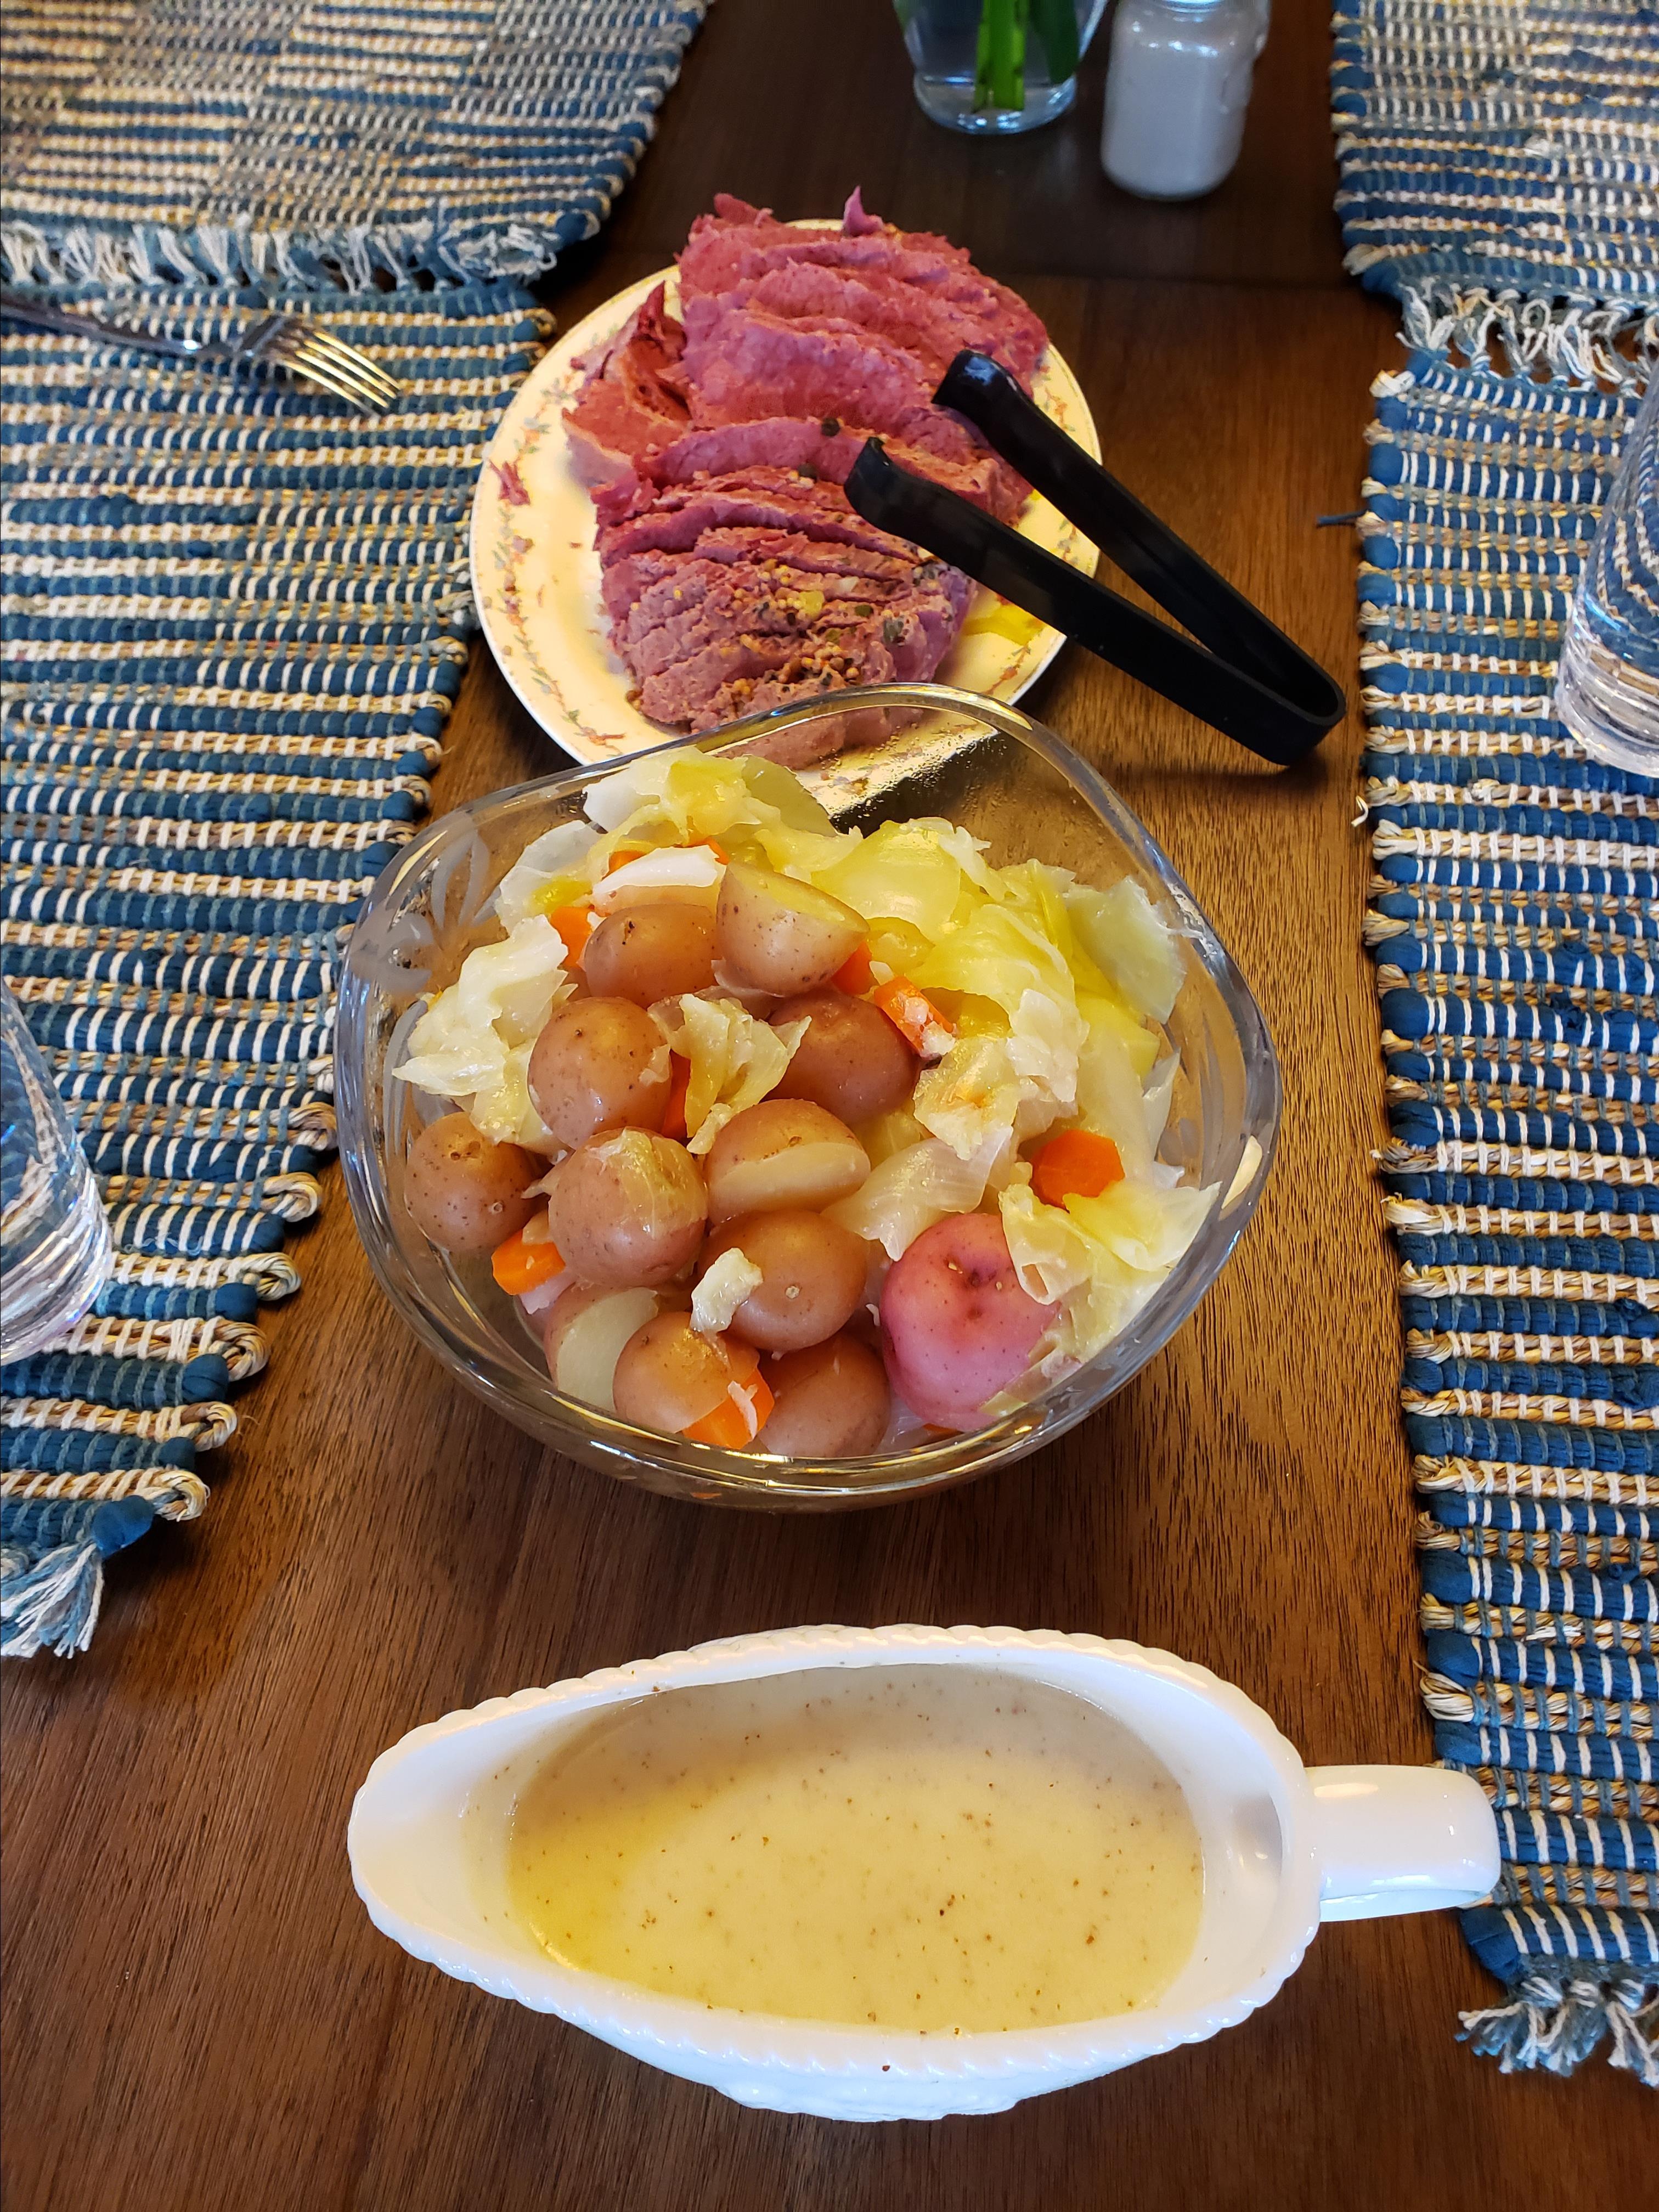 Corned Beef Dinner for St. Patrick's Day D Carrasco